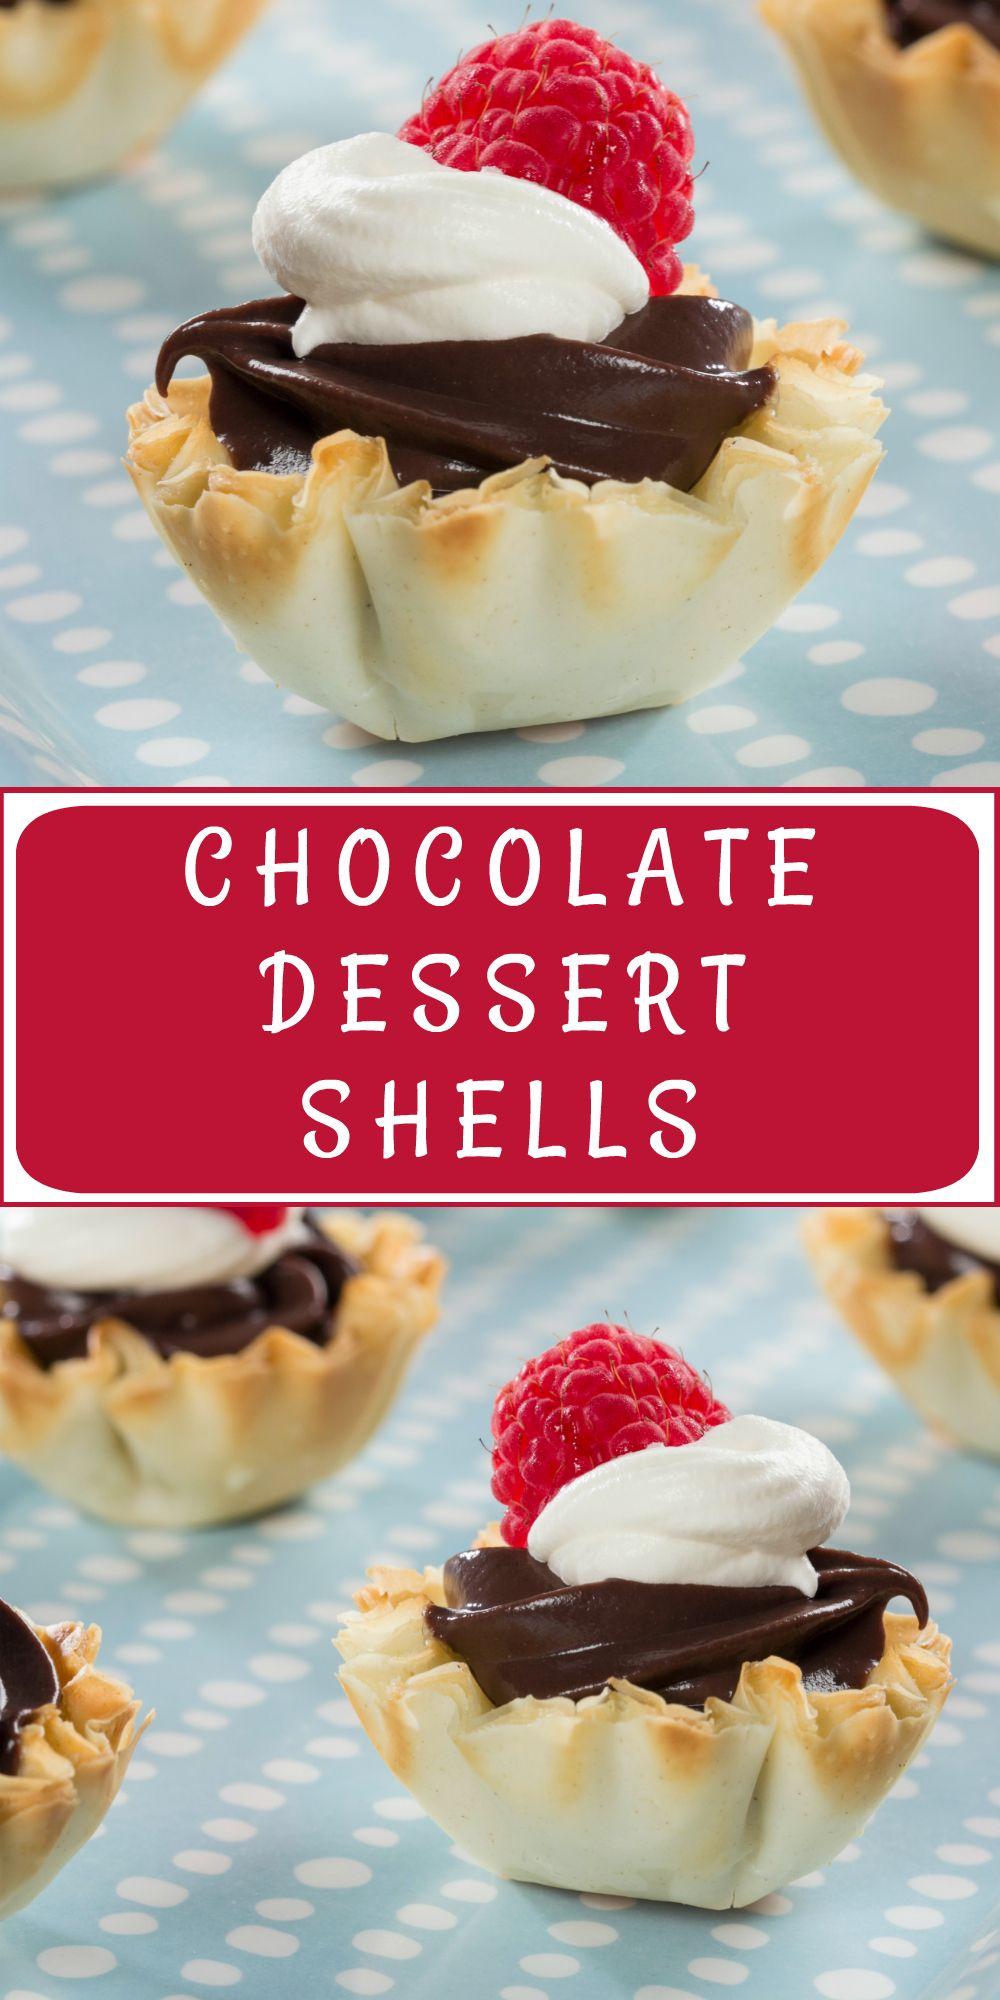 Chocolate Dessert Shells Make The Perfect Diabetic Friendly